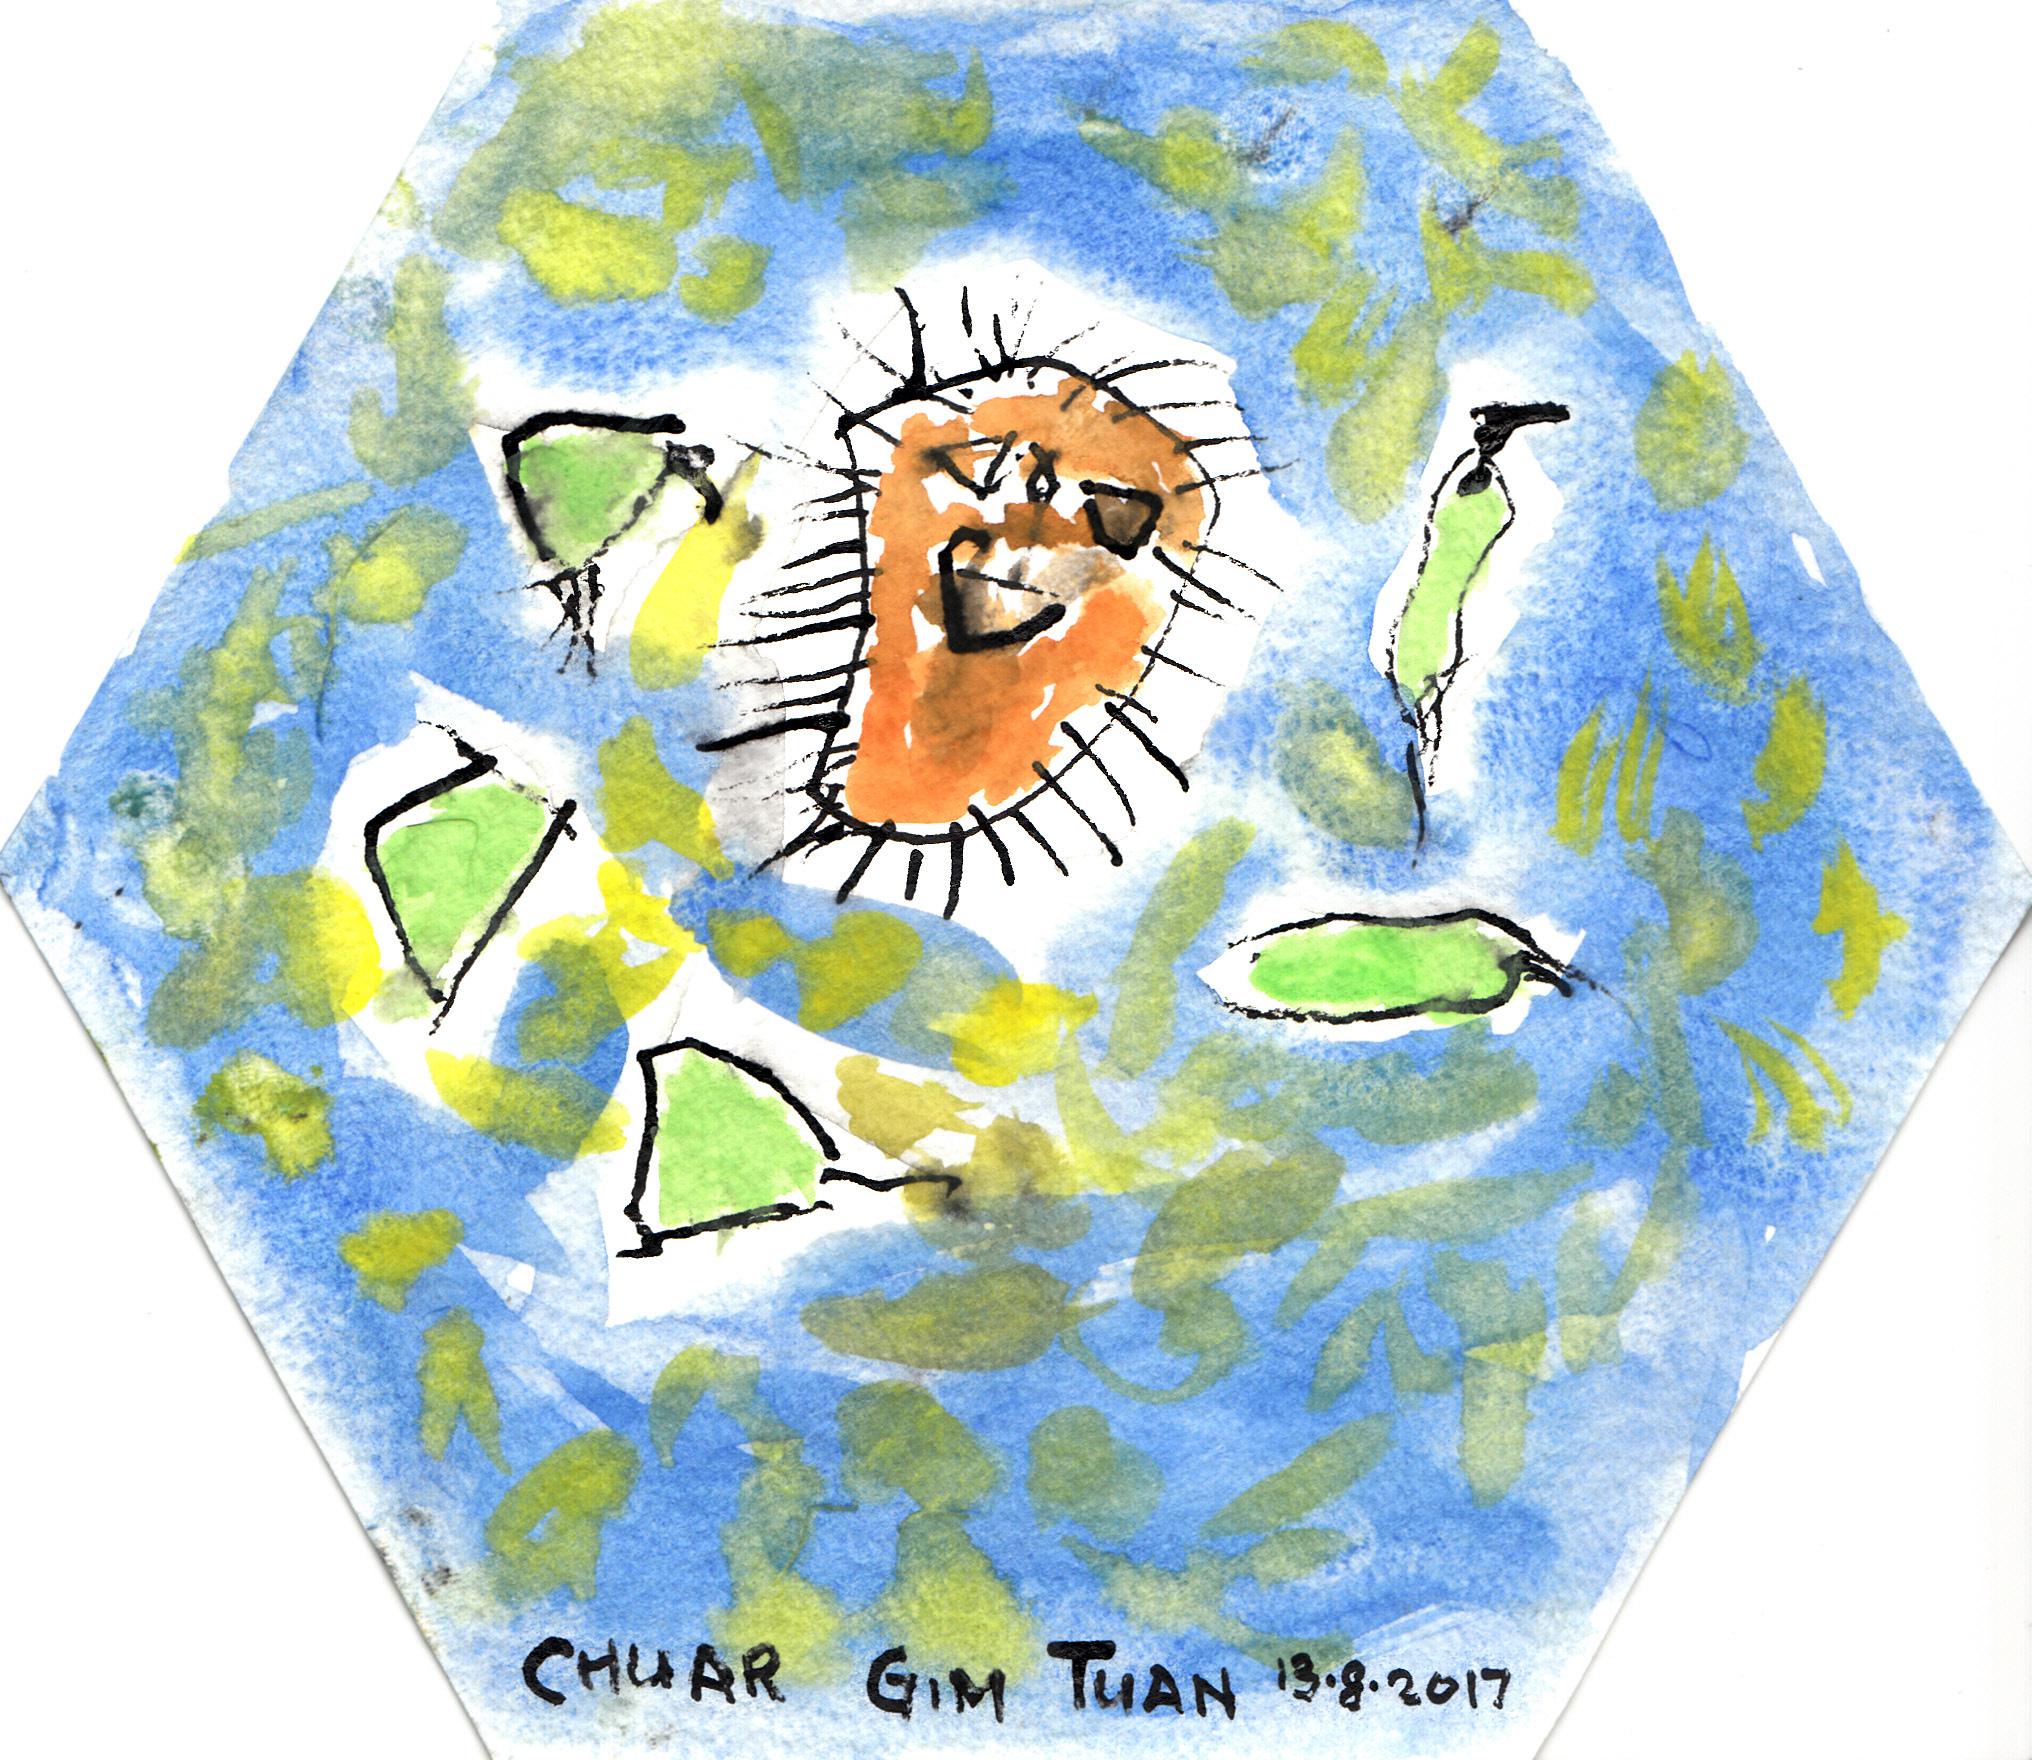 Chuar Gim Thuan 08.jpg